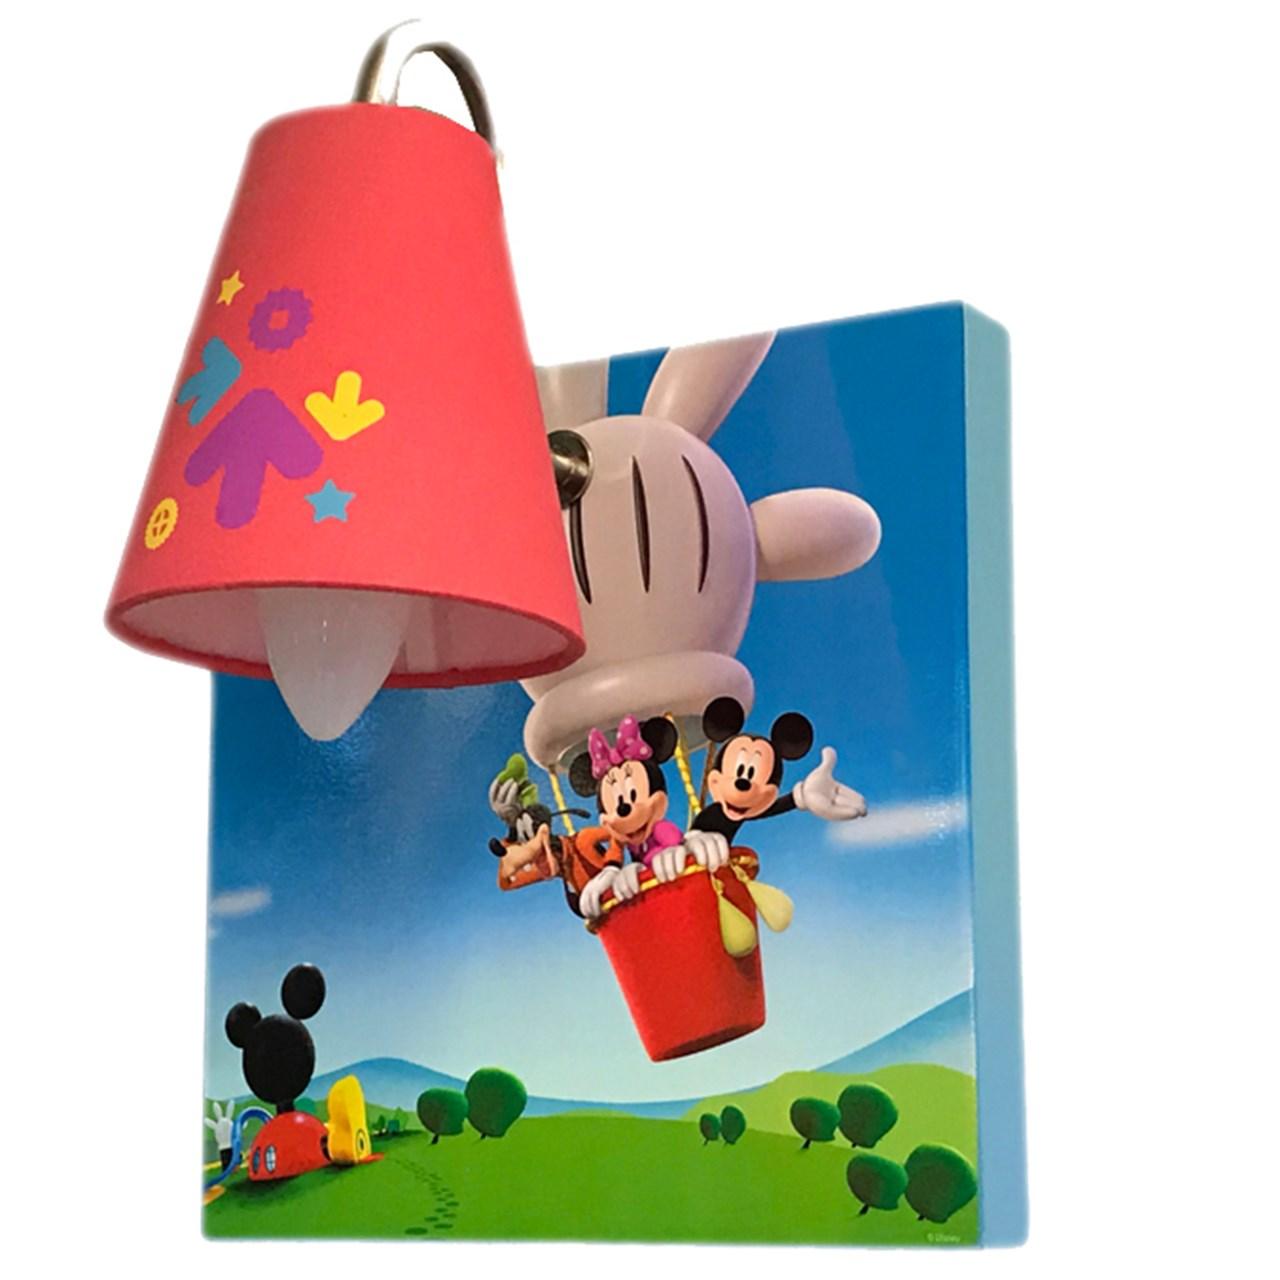 چراغ دیوارکوب دکوفان مدل Mickey Mouse 2